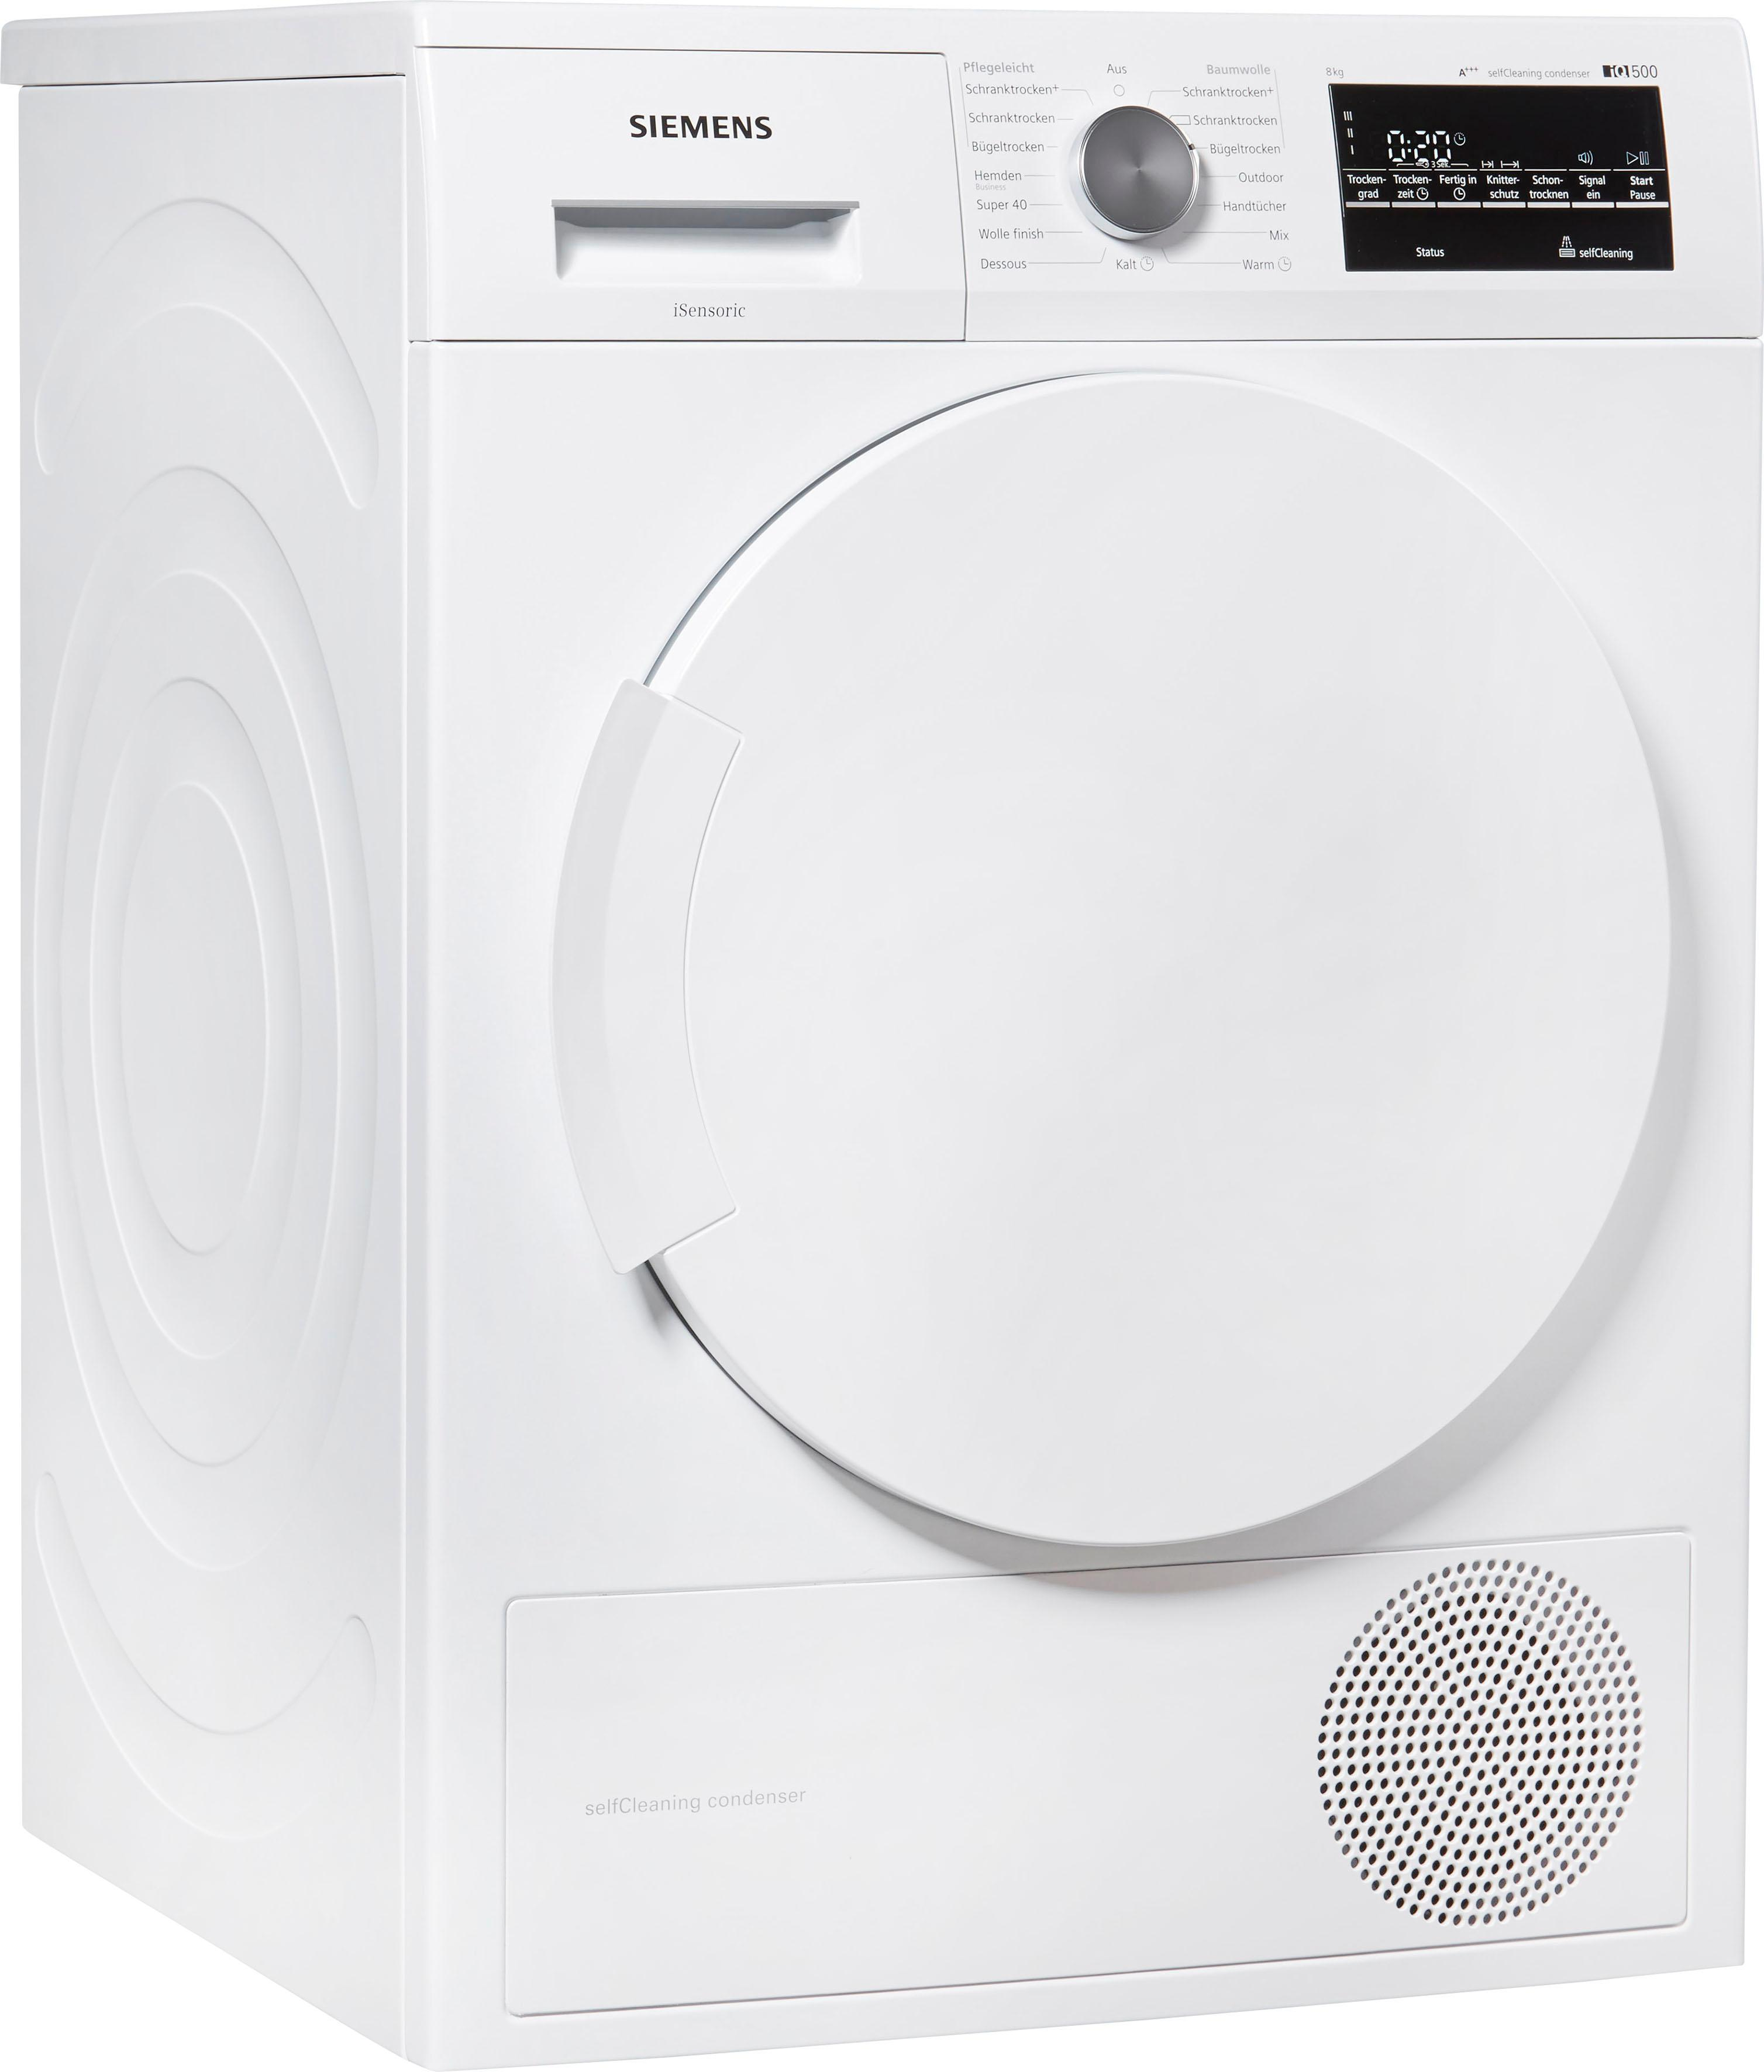 SIEMENS Wärmepumpentrockner IQ500 WT45W4ECO 8 kg | Bad > Waschmaschinen und Trockner > Wärmepumpentrockner | Weiß | Siemens